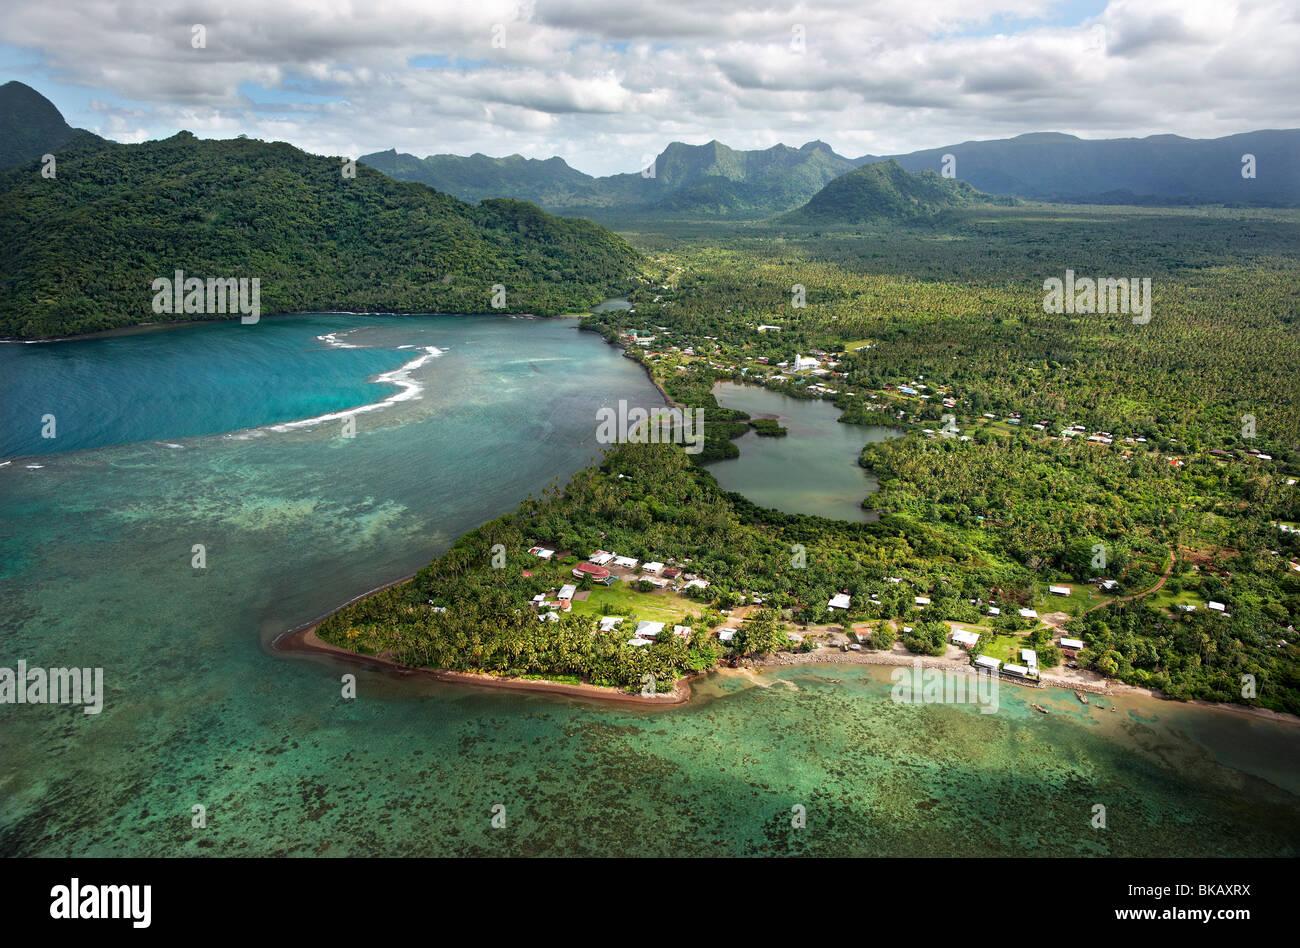 Aerial view, Falefa Bay and village, Upolu, Samoa - Stock Image